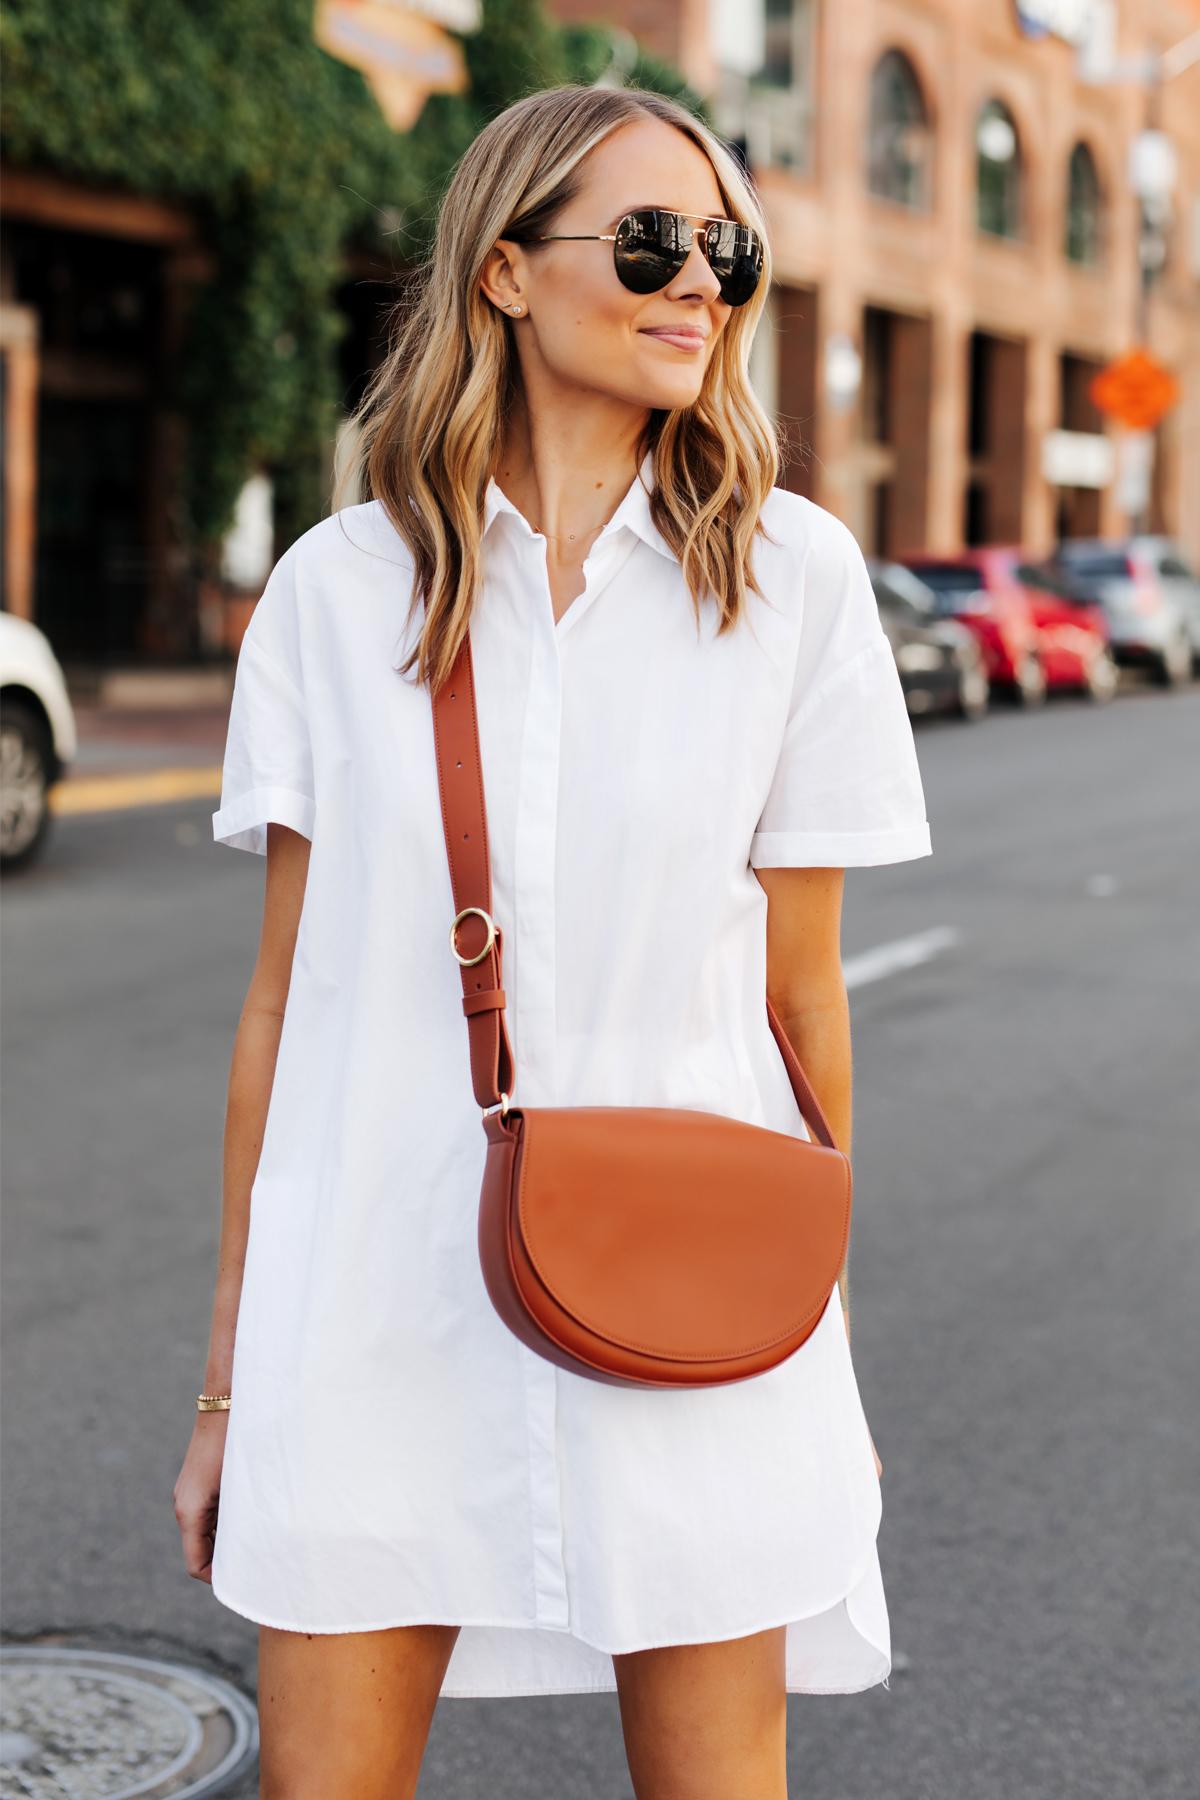 Blonde Woman Wearing White Shirtdress Cuyana Half Moon Bag Caramel Fashion Jackson San Diego Fashion Blogger Street Style